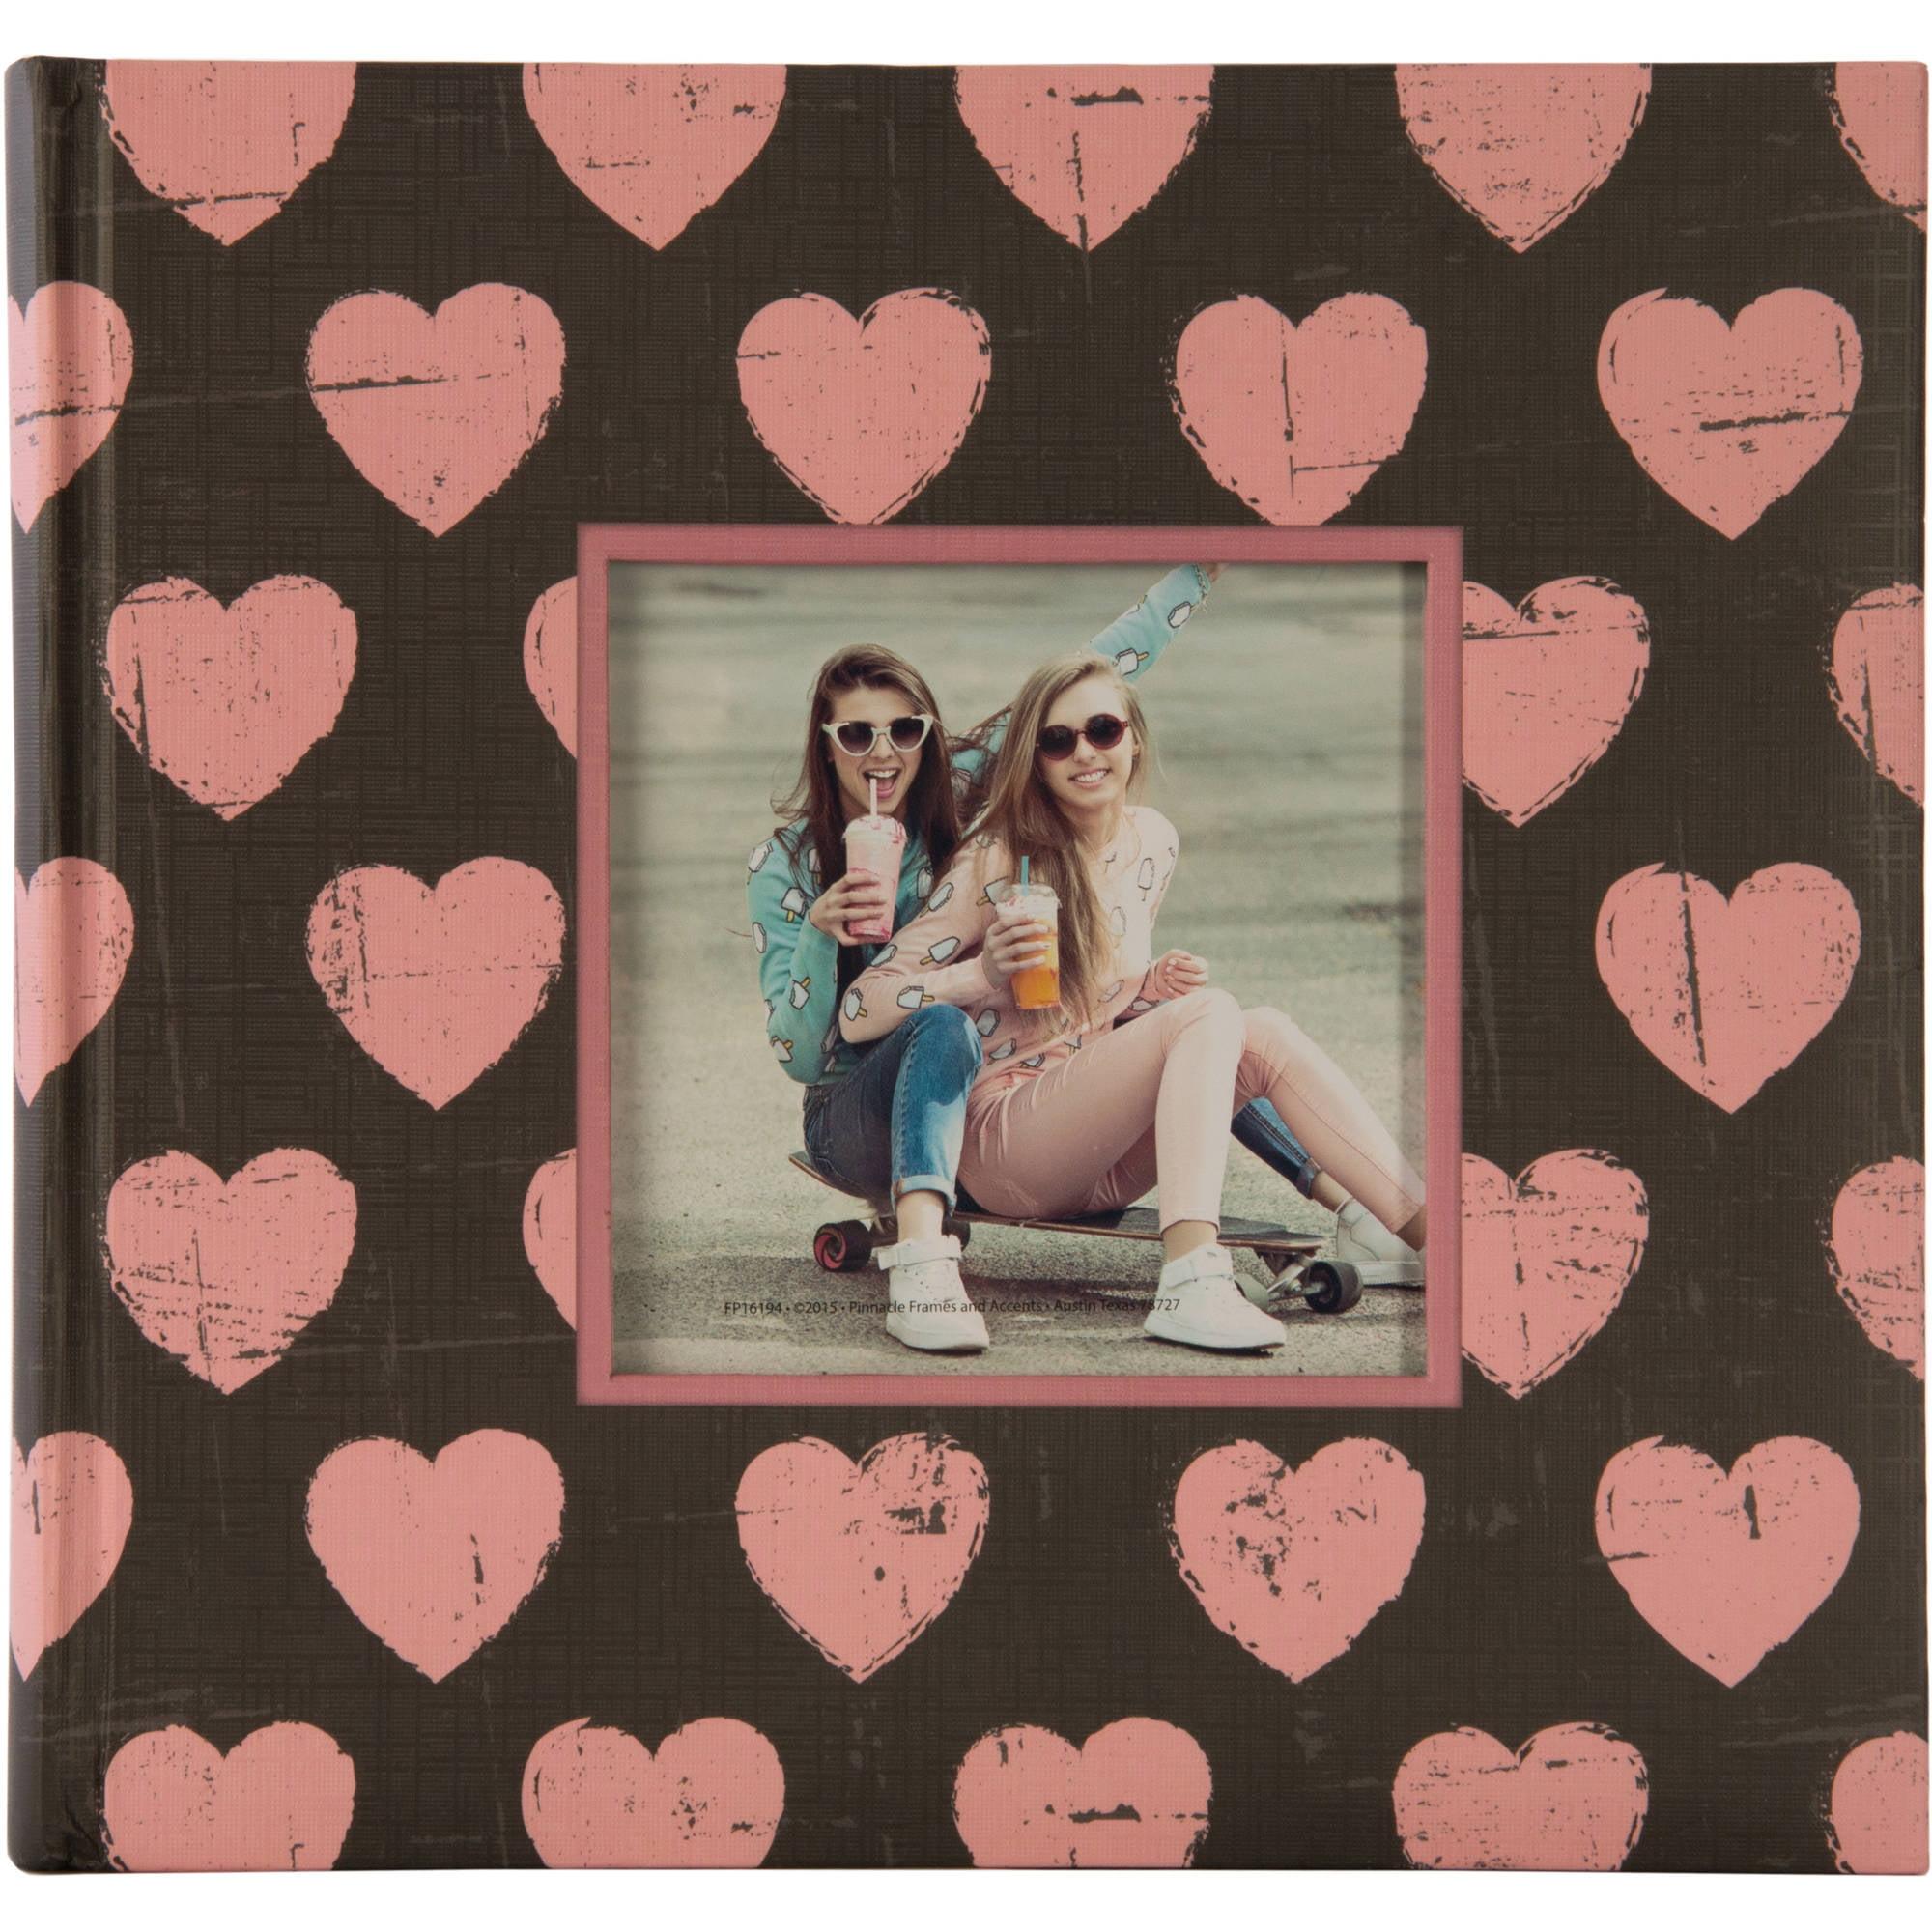 2UP Hearts Framed Front Photo Album, Pink